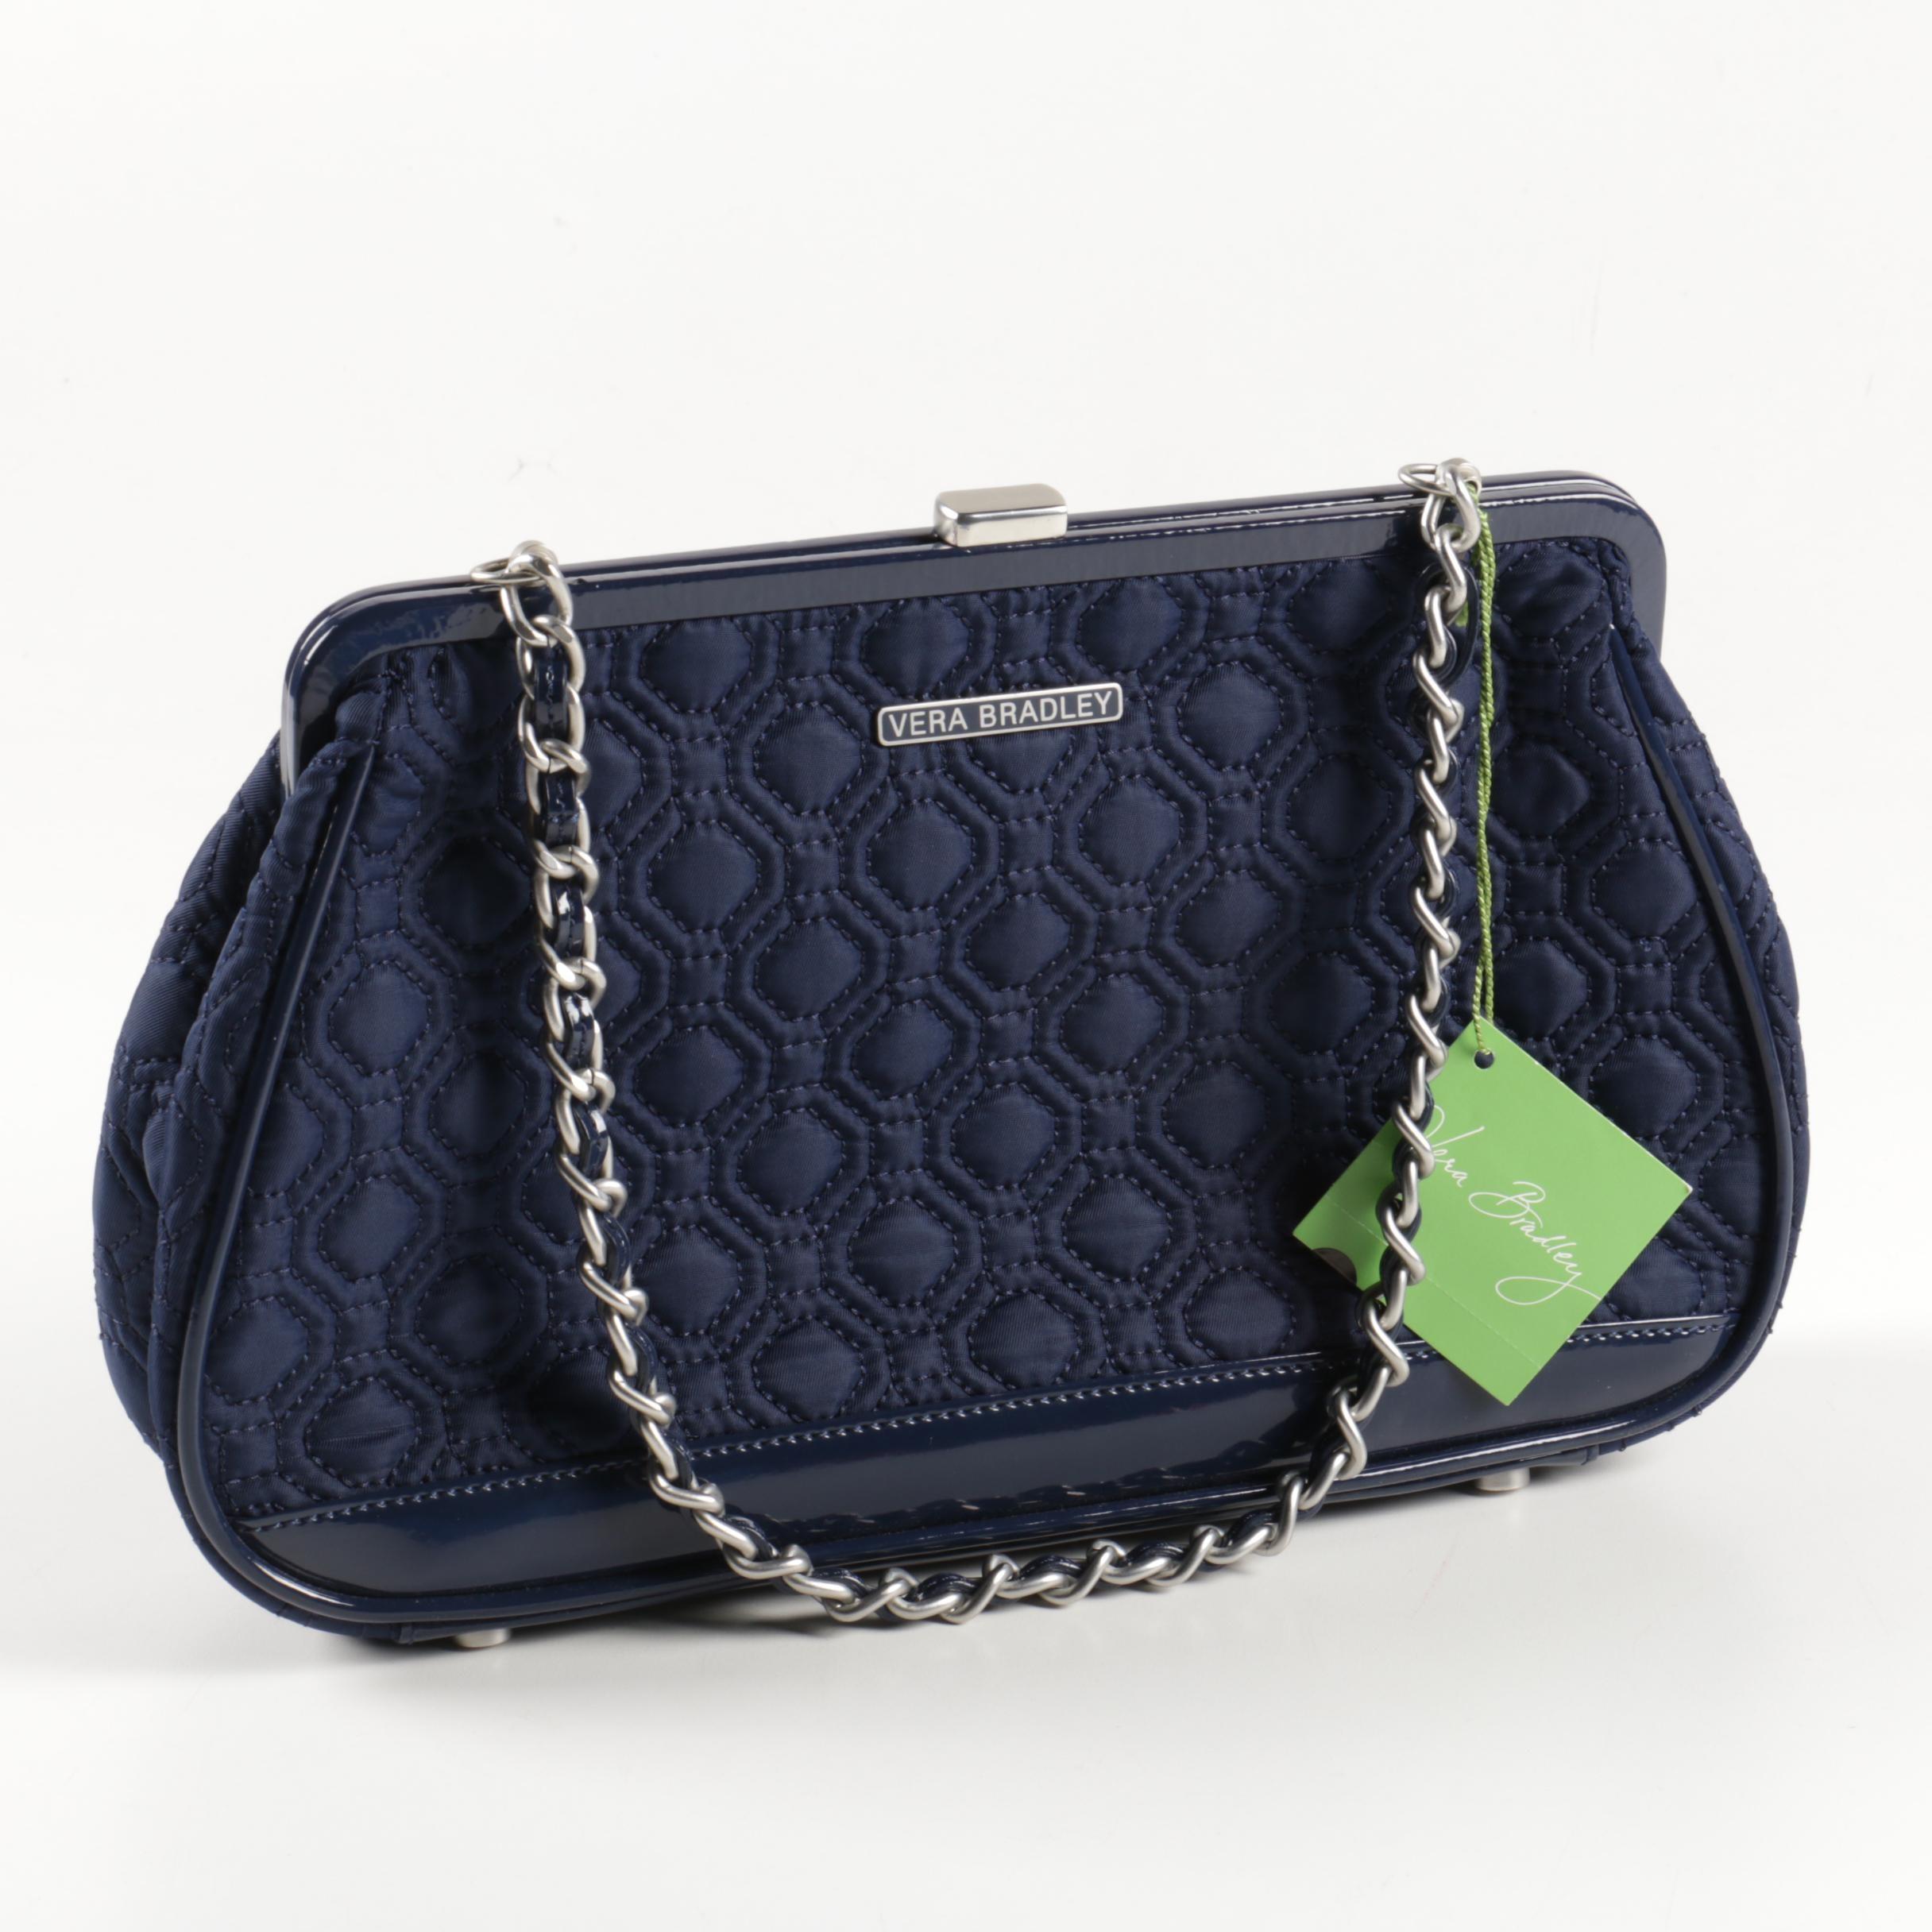 Vera Bradley Chain Link Handbag